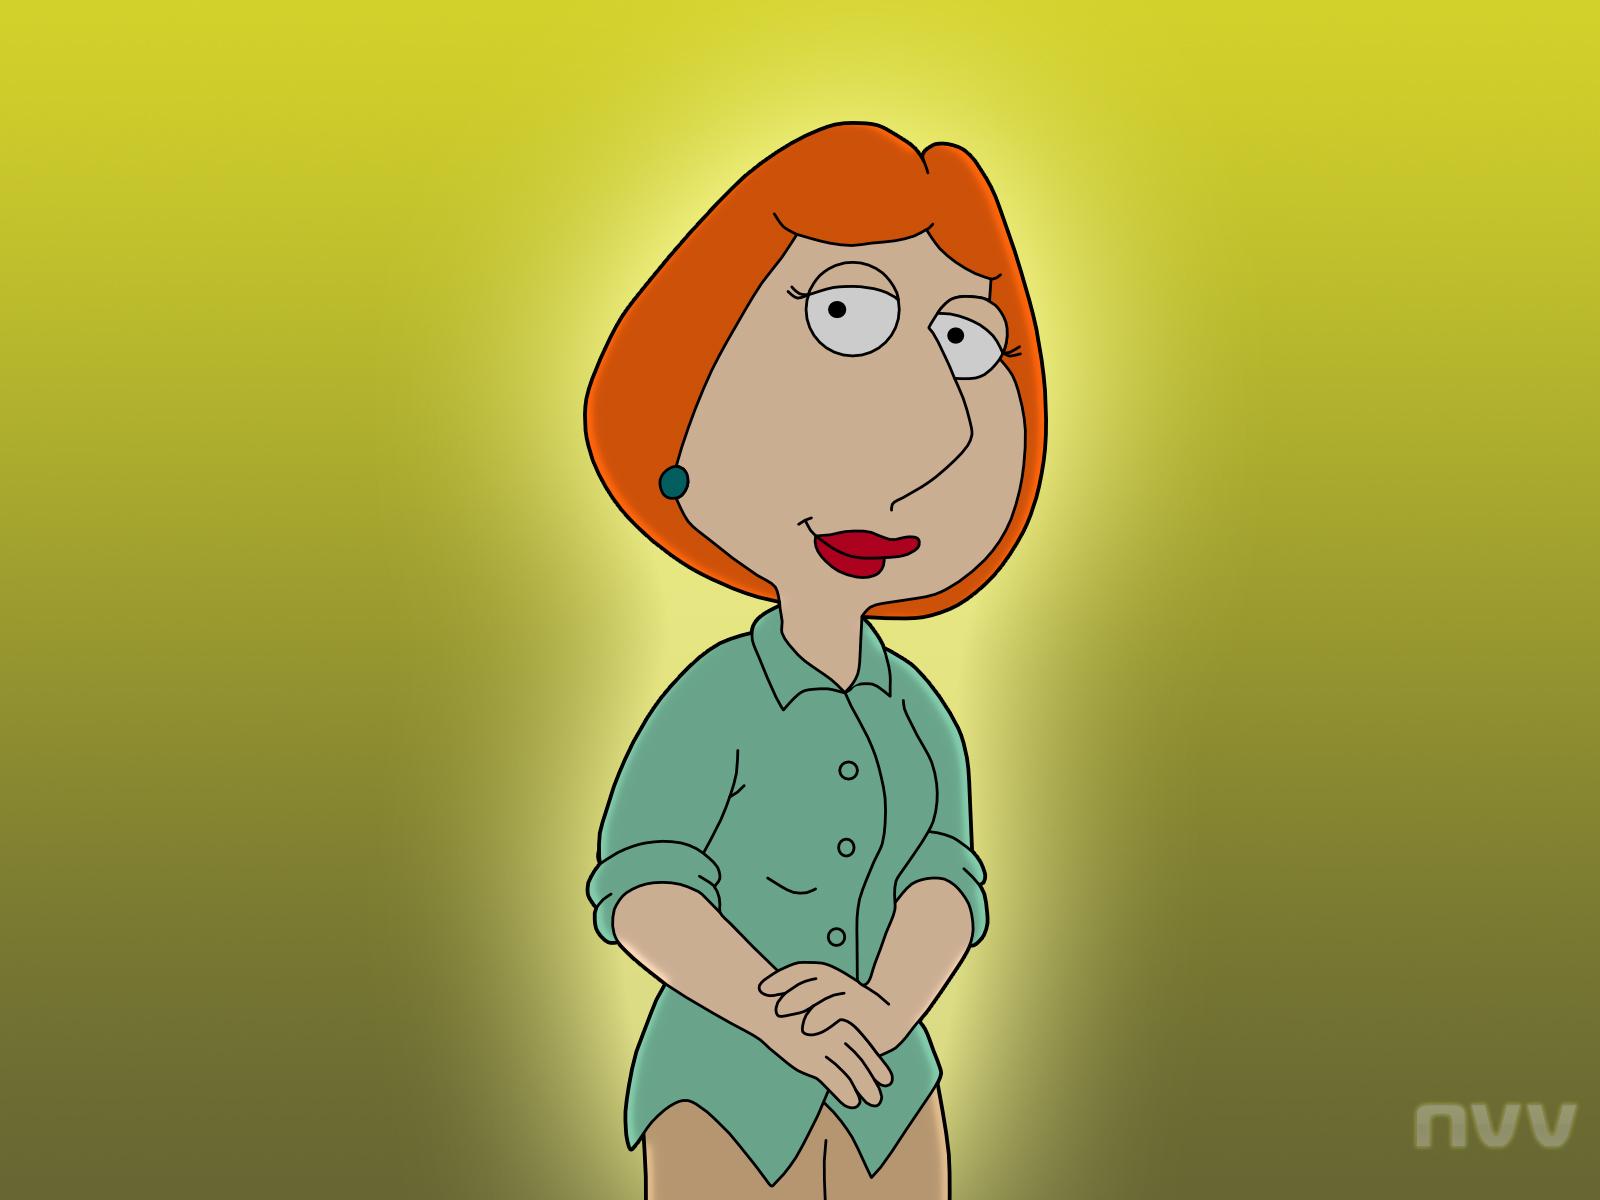 Naked Louis Family Guy Nude Jpg